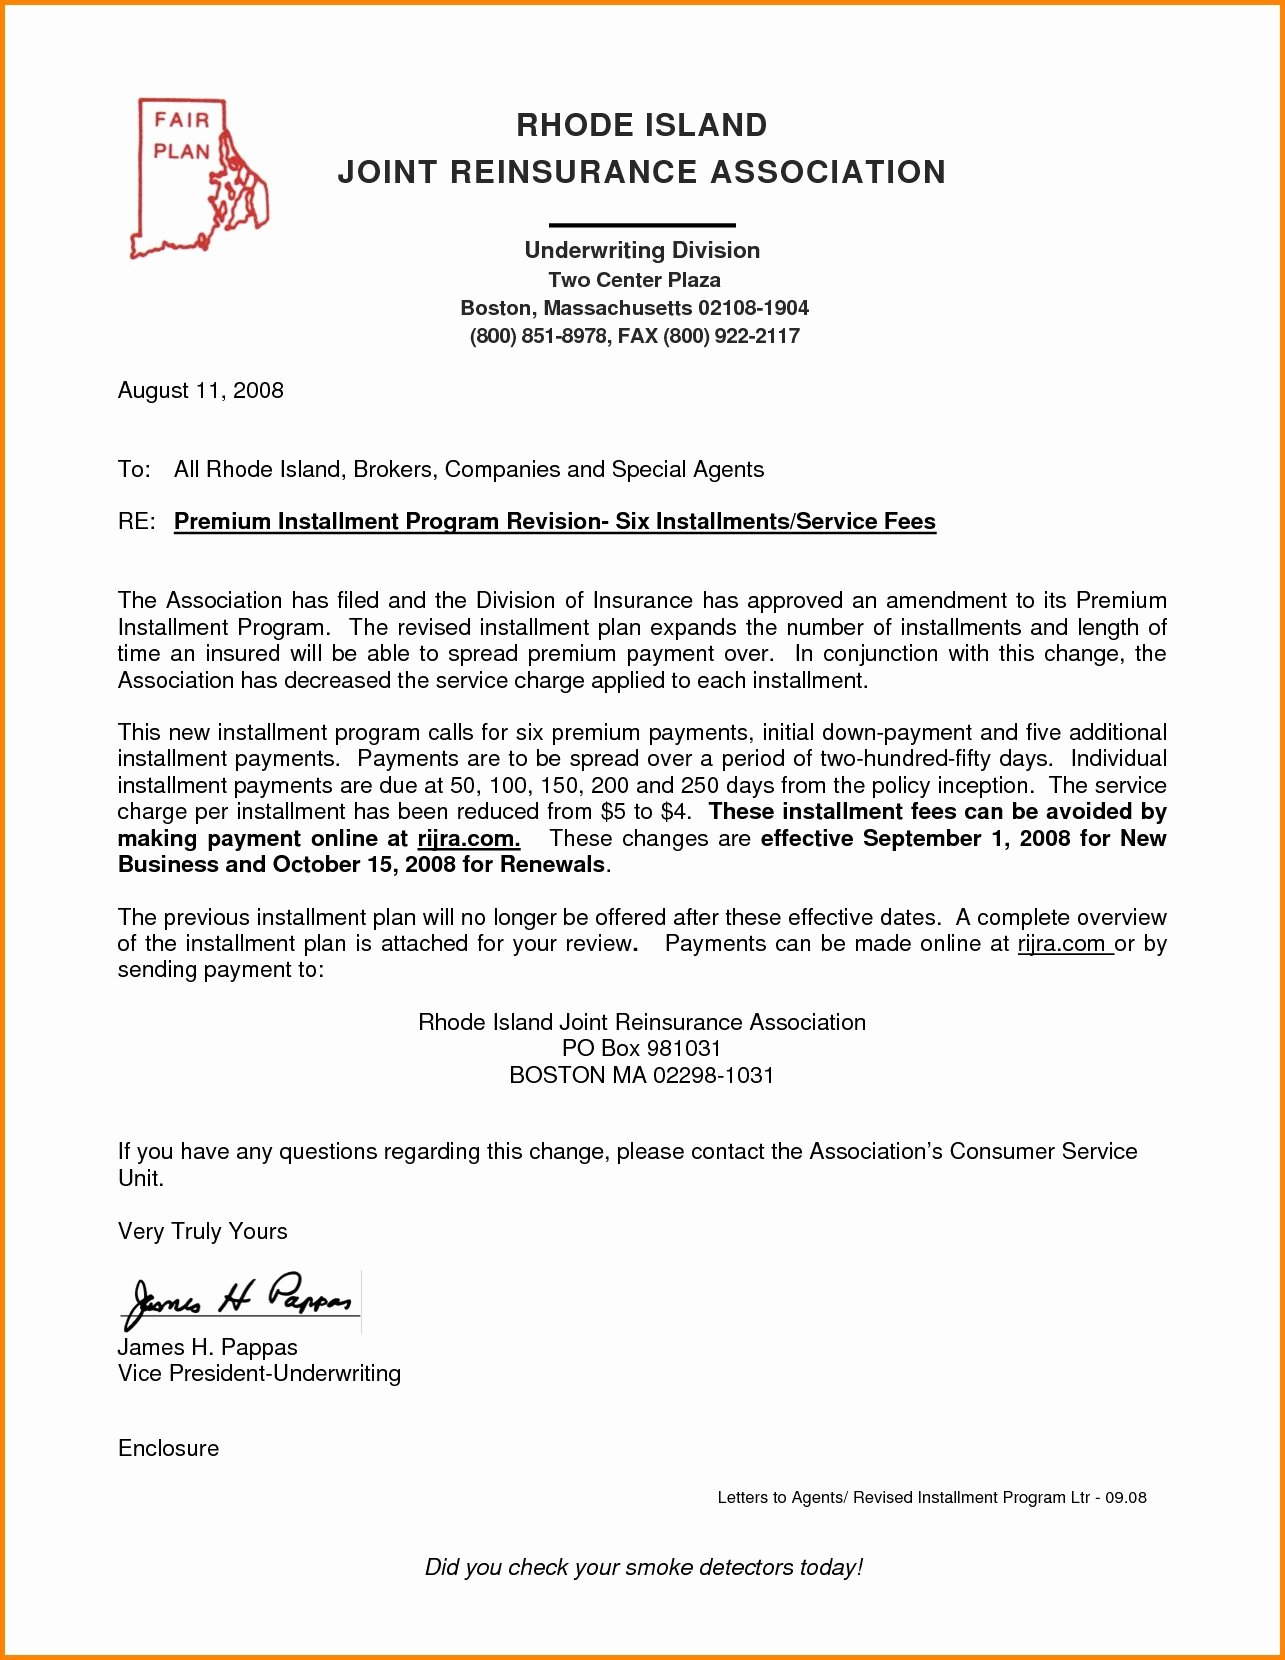 Business Letter Enclosure format Fresh Enclosures Letter format